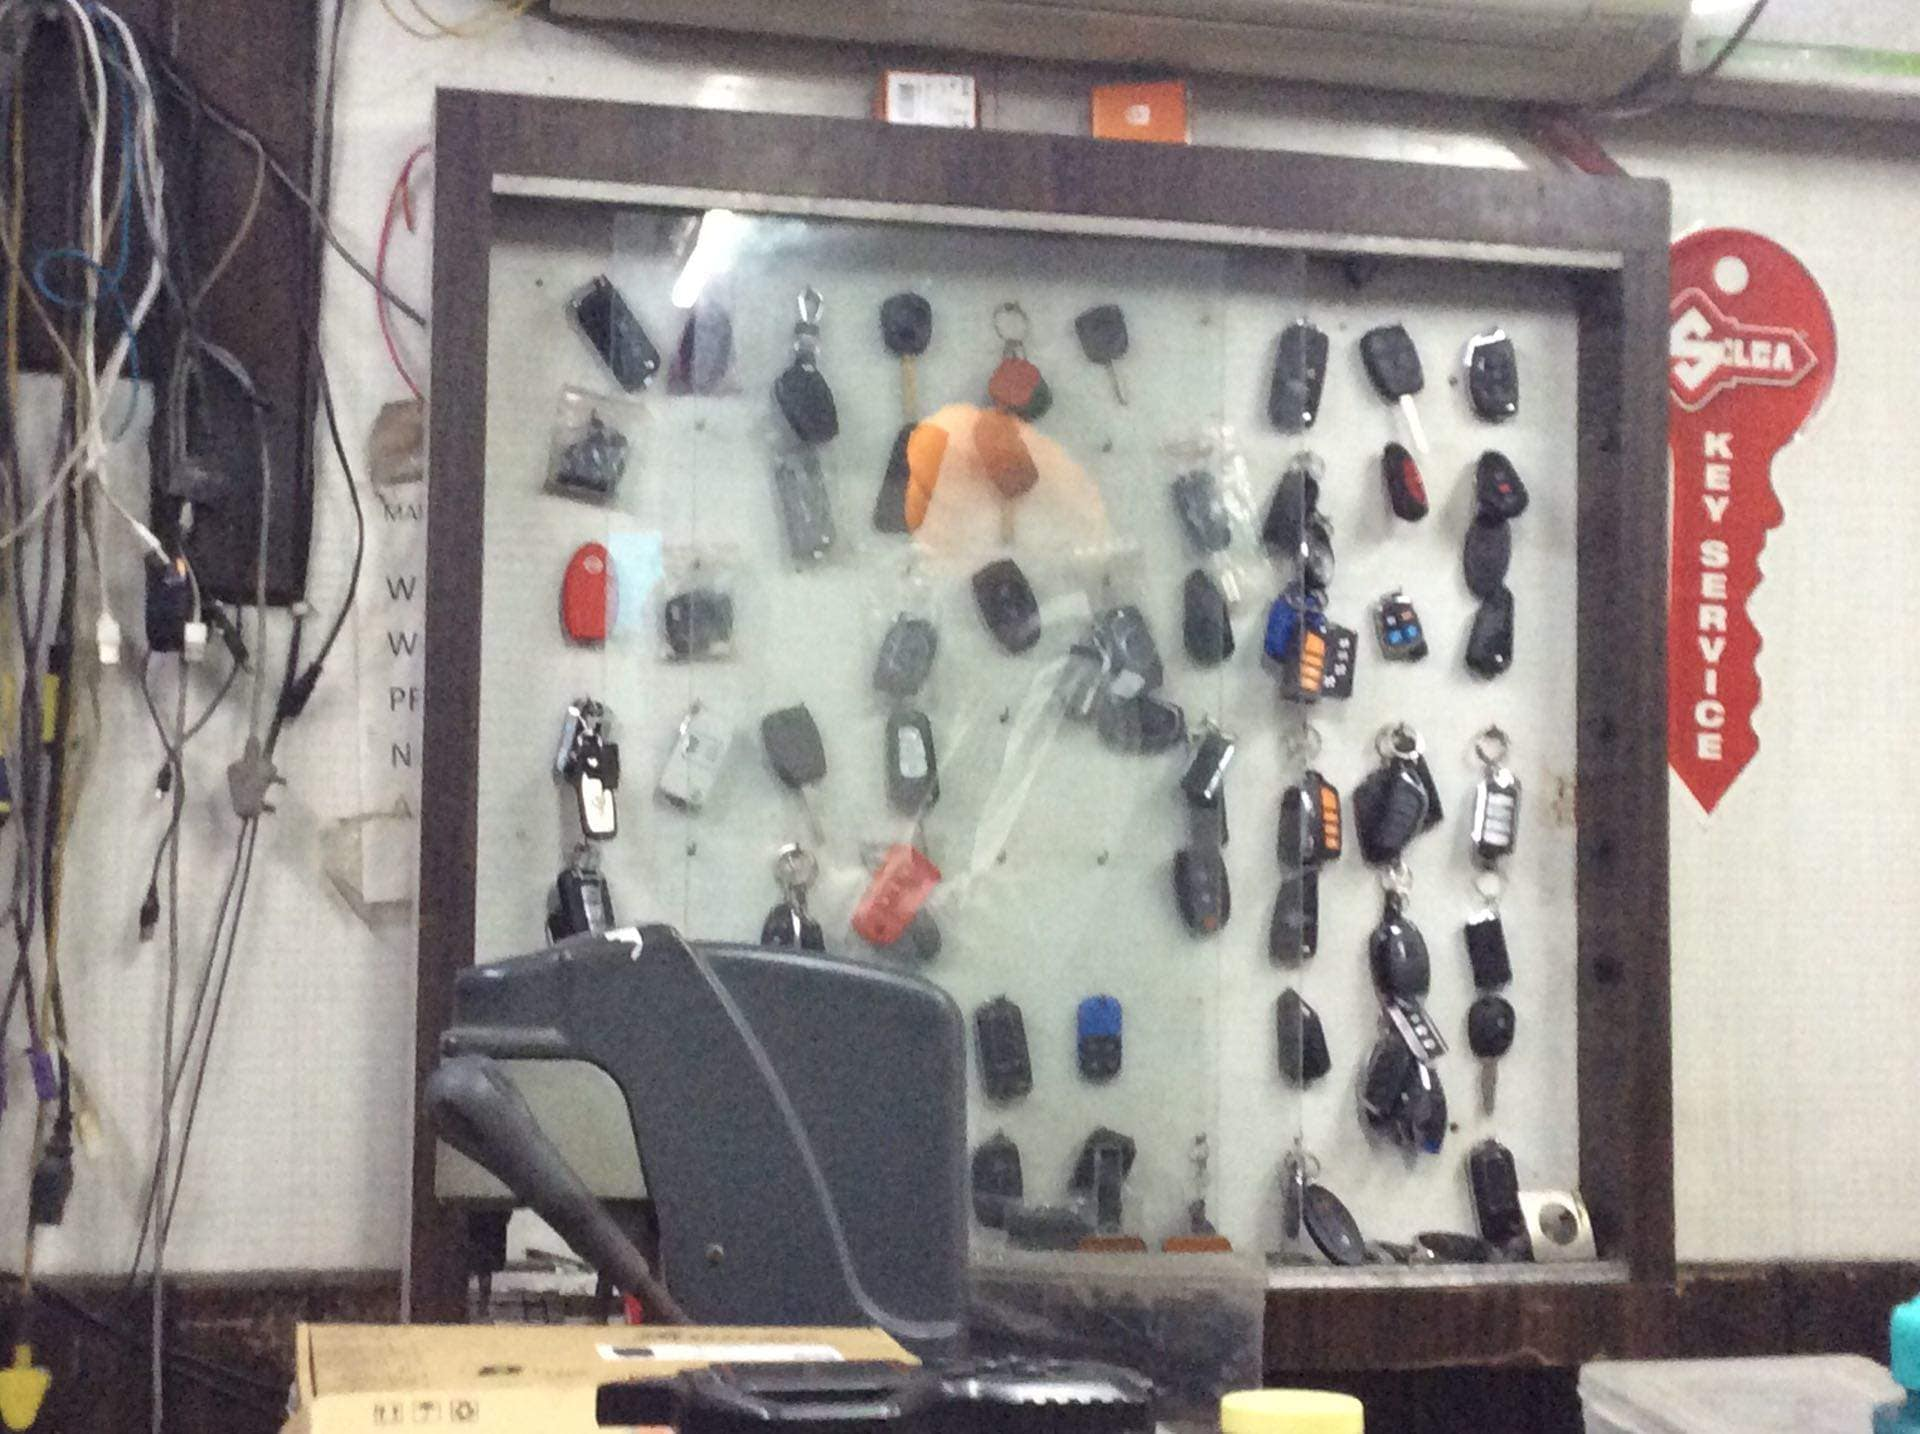 Top 10 Duplicate Key Makers in Amritsar - Best Key Makers